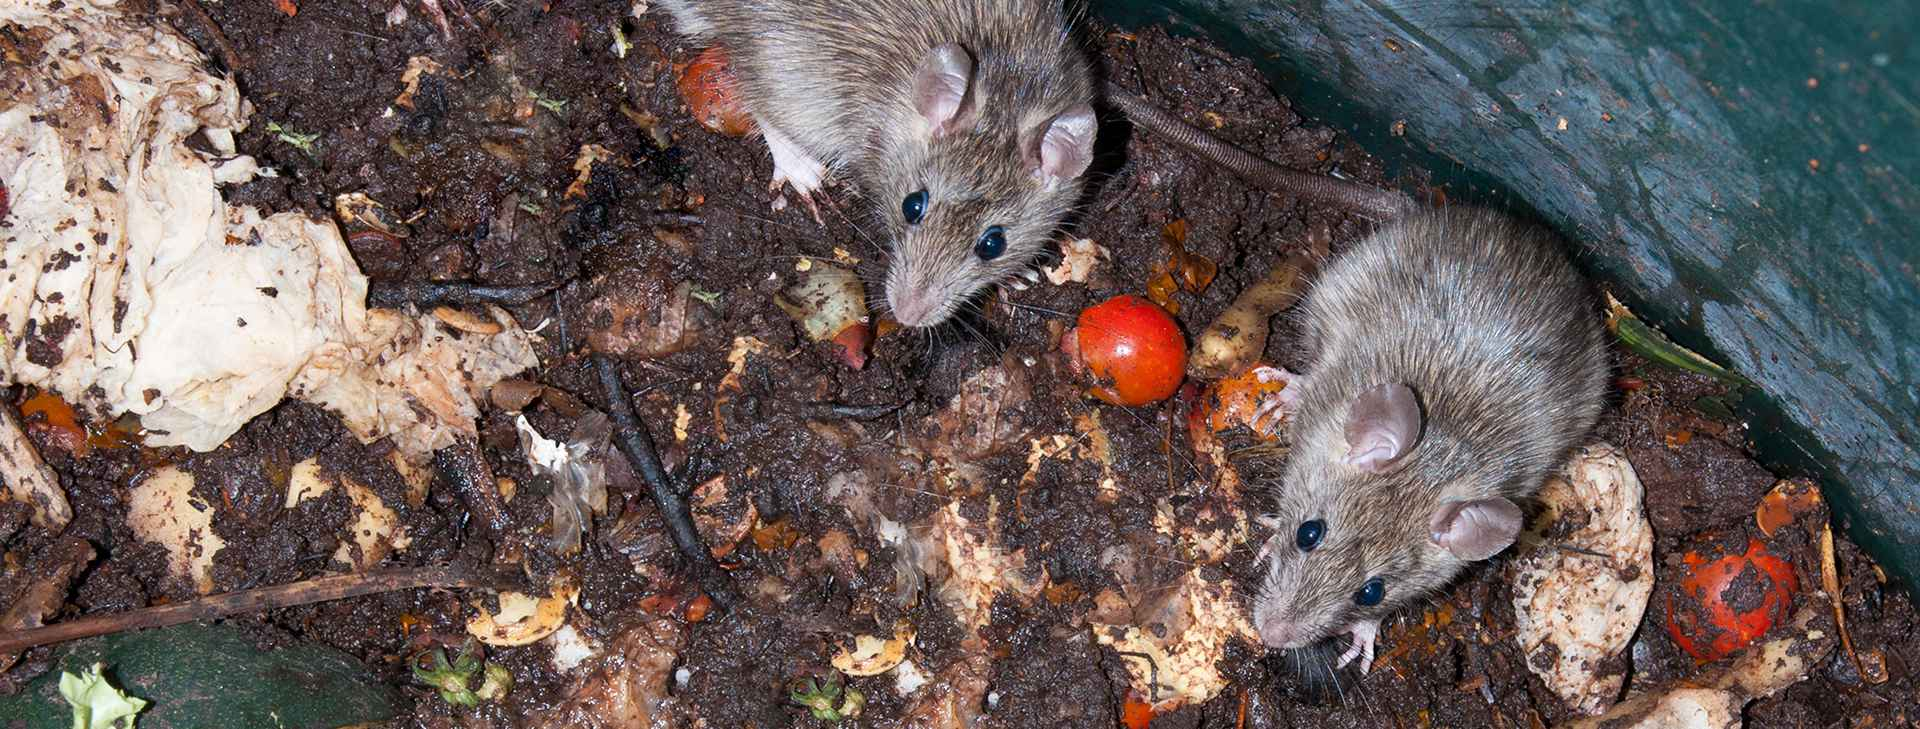 Rats resized